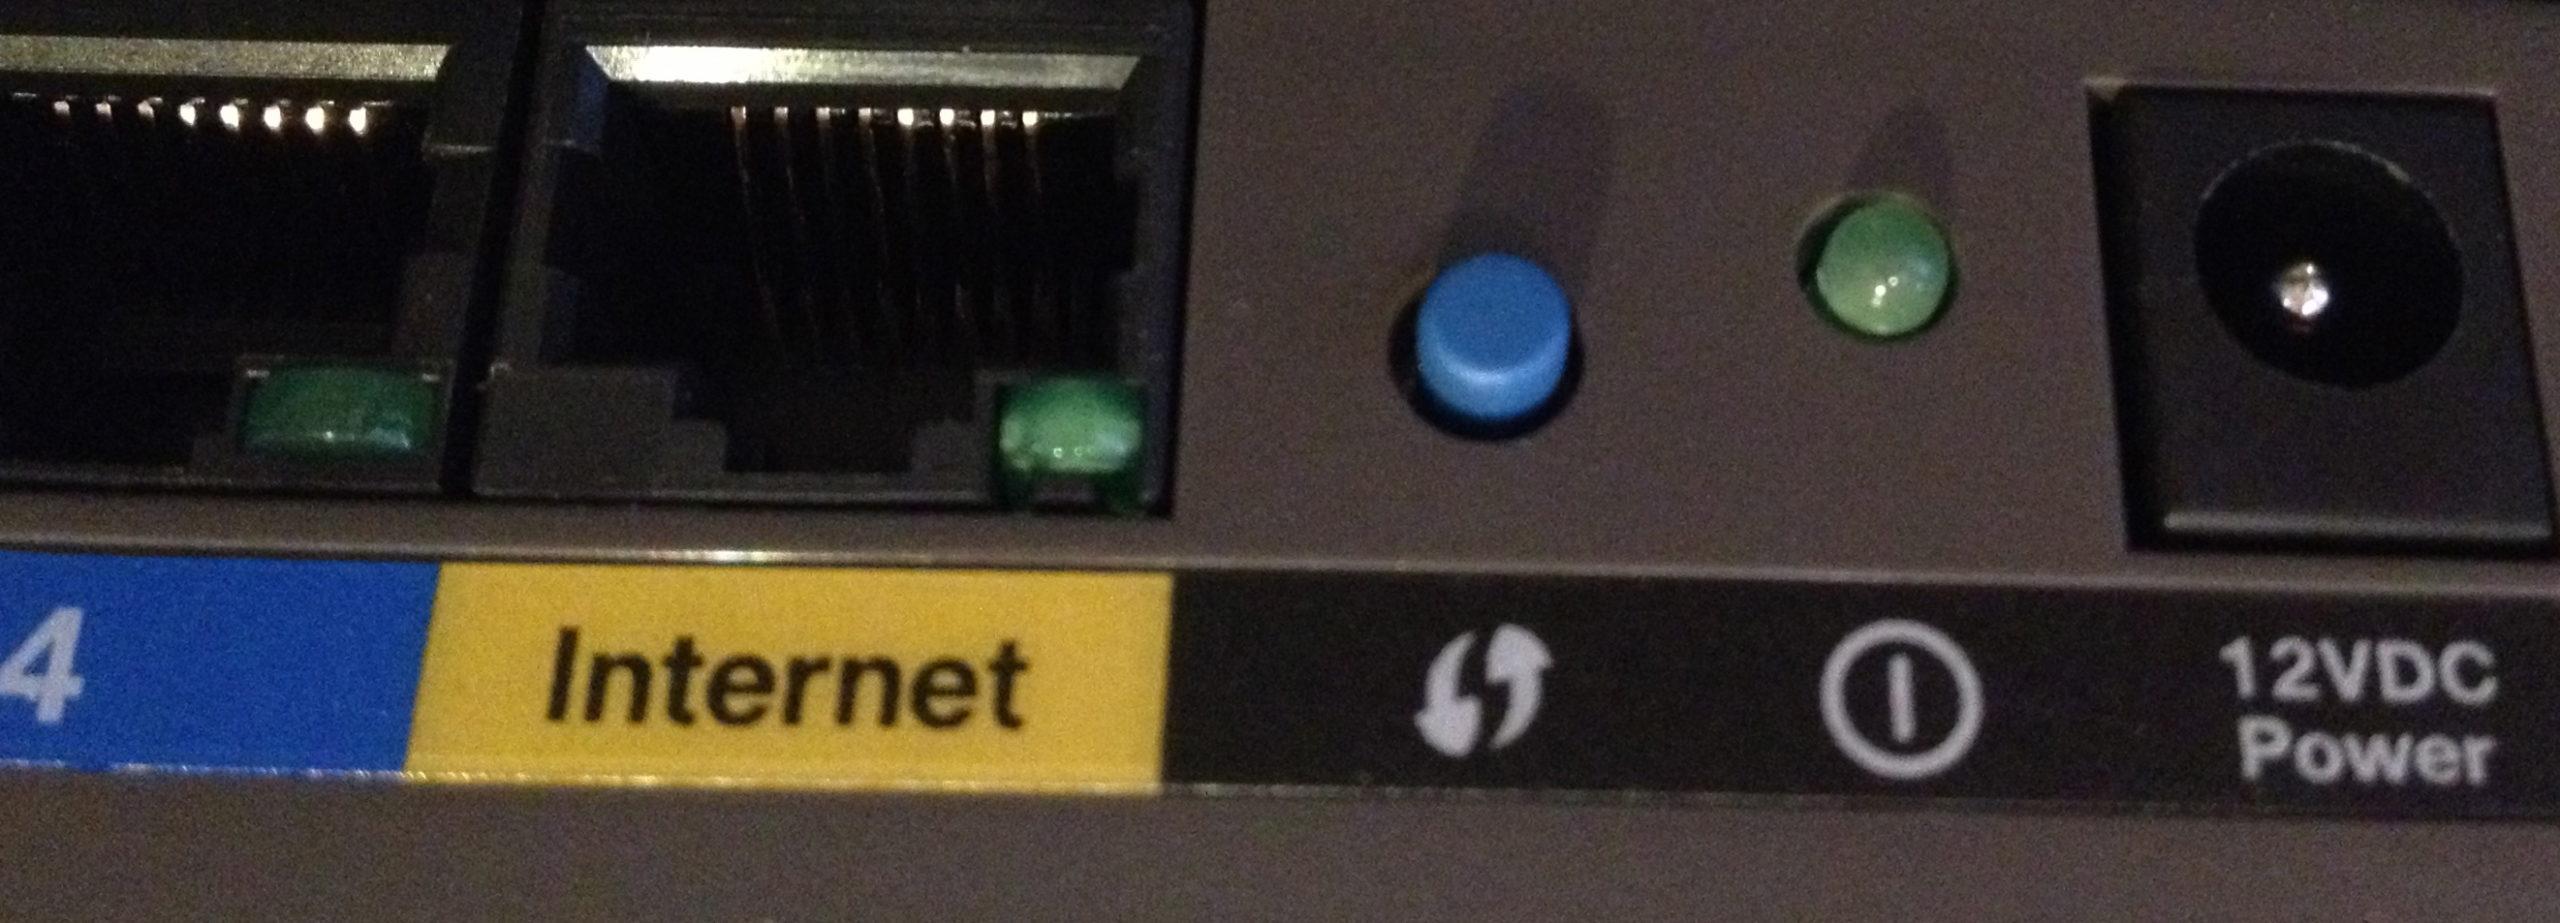 chto takoe wifi protected setup